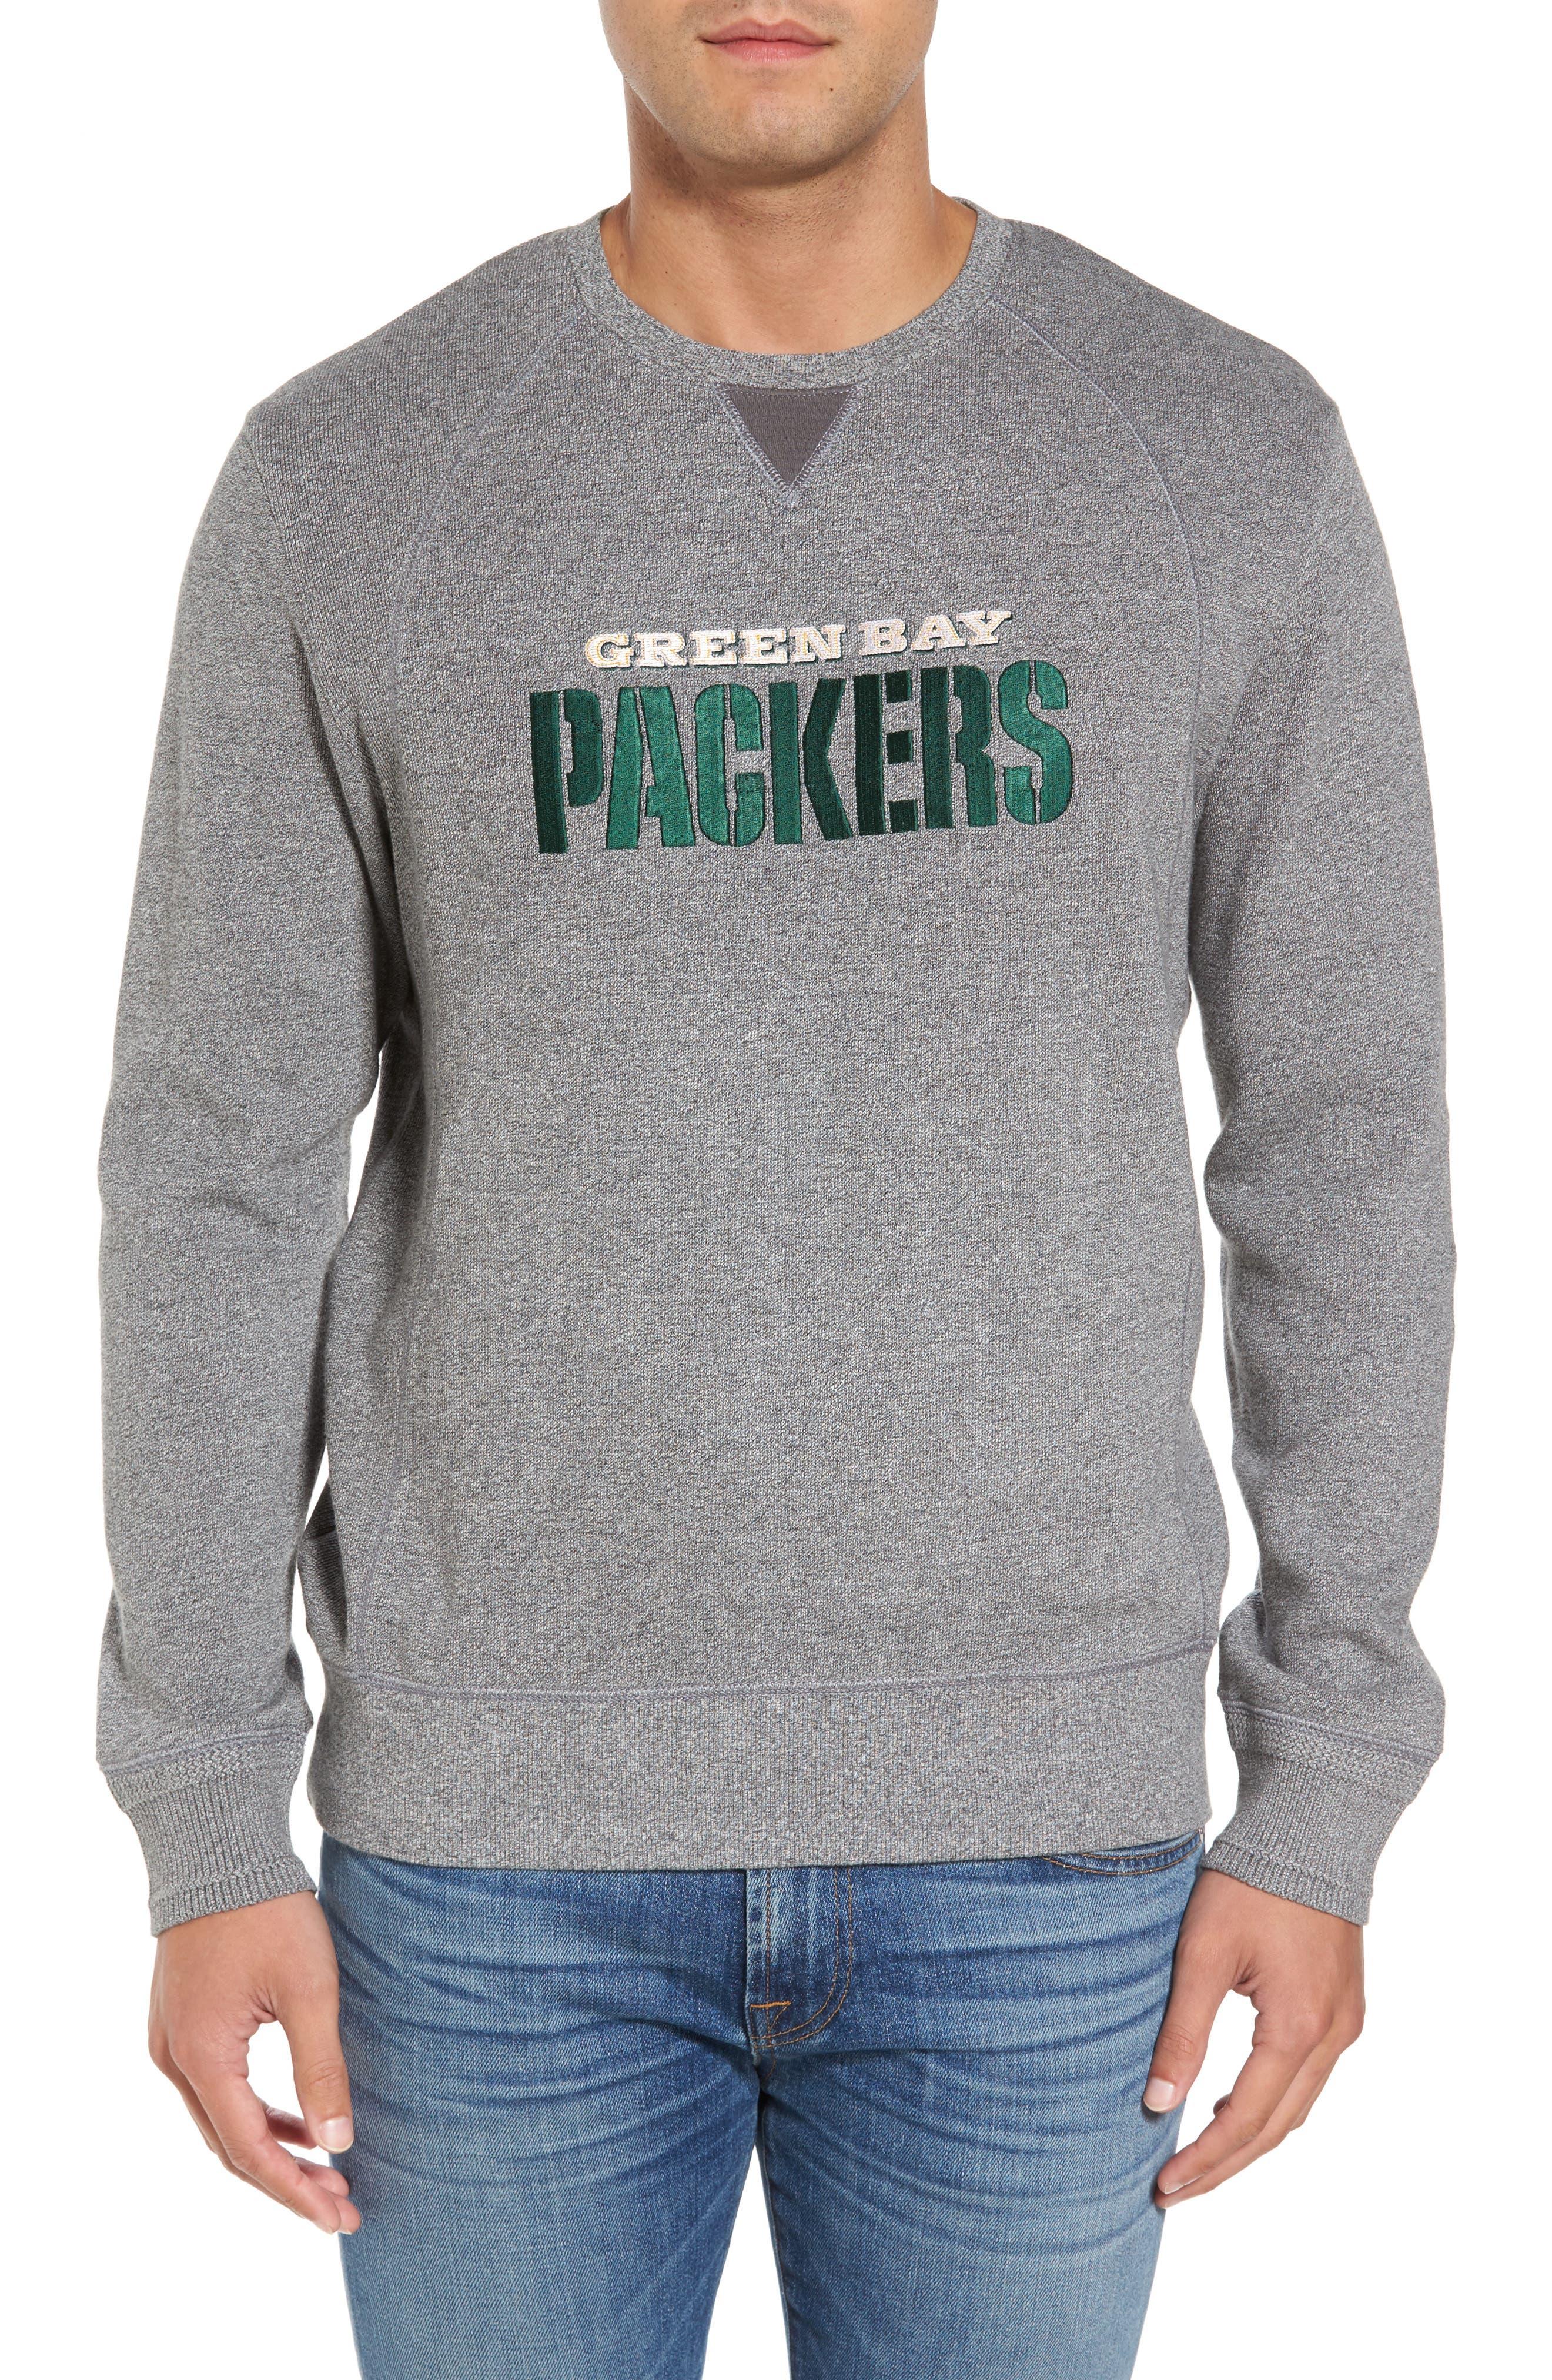 NFL Stitch of Liberty Embroidered Crewneck Sweatshirt,                             Main thumbnail 20, color,